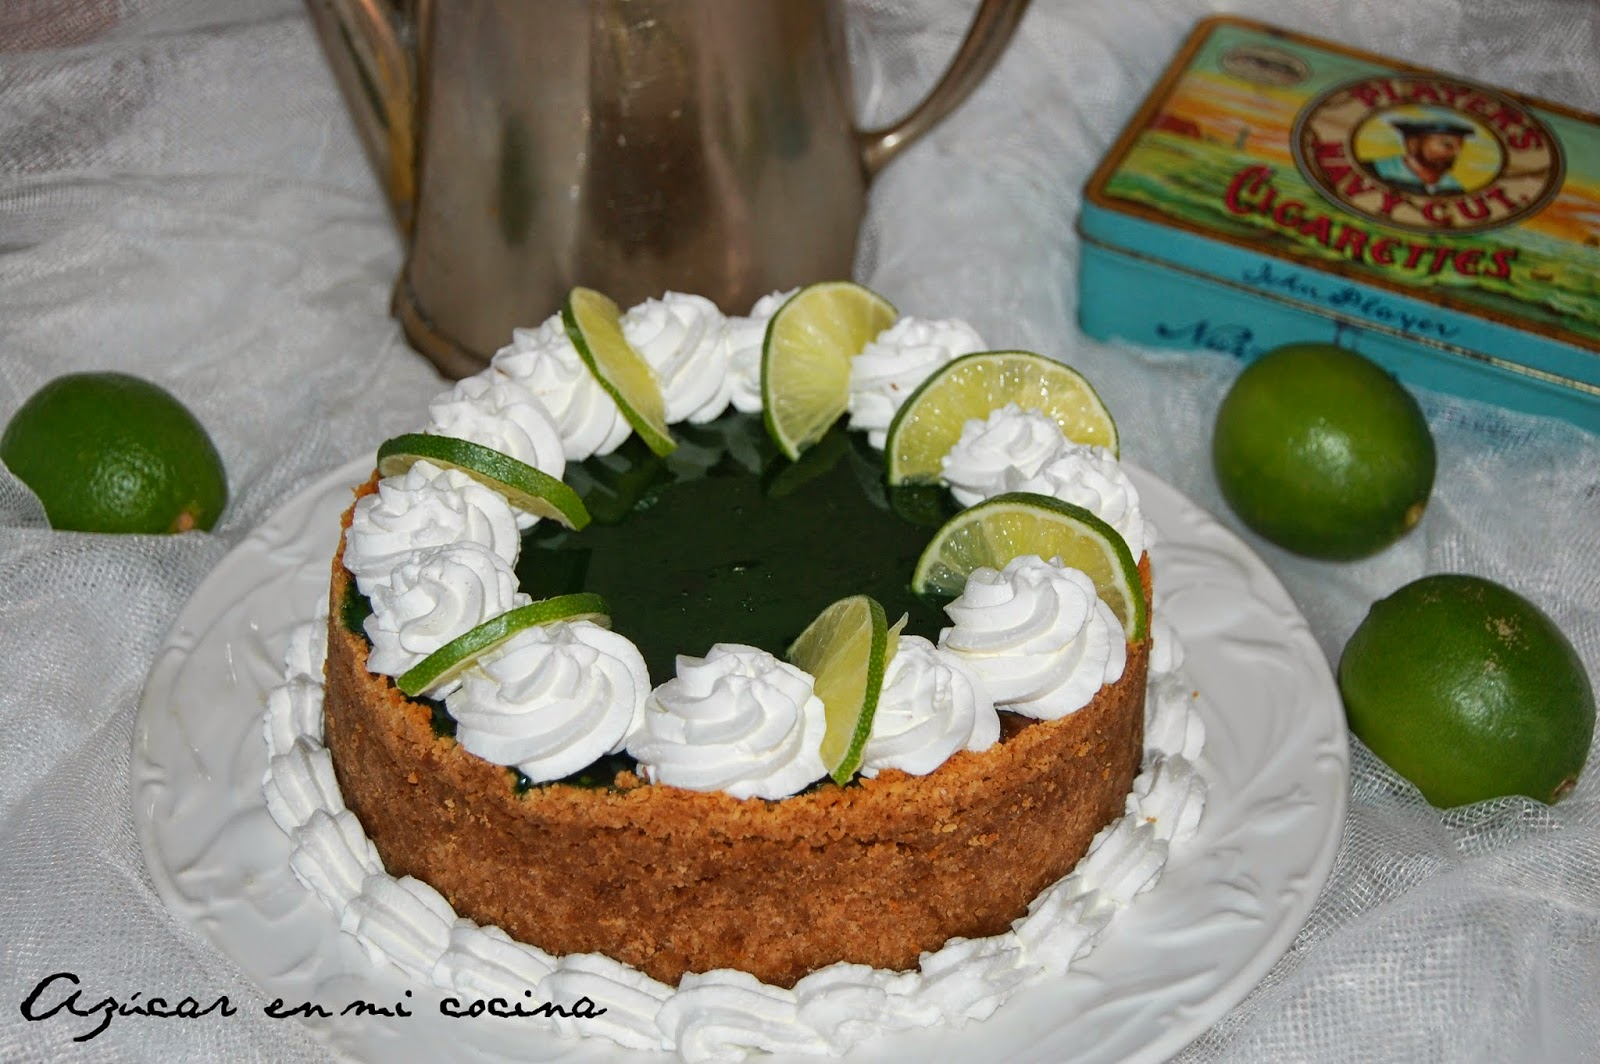 http://azucarenmicocina.blogspot.com.es/2014/07/cheesecake-de-lima-y-sorteo.html